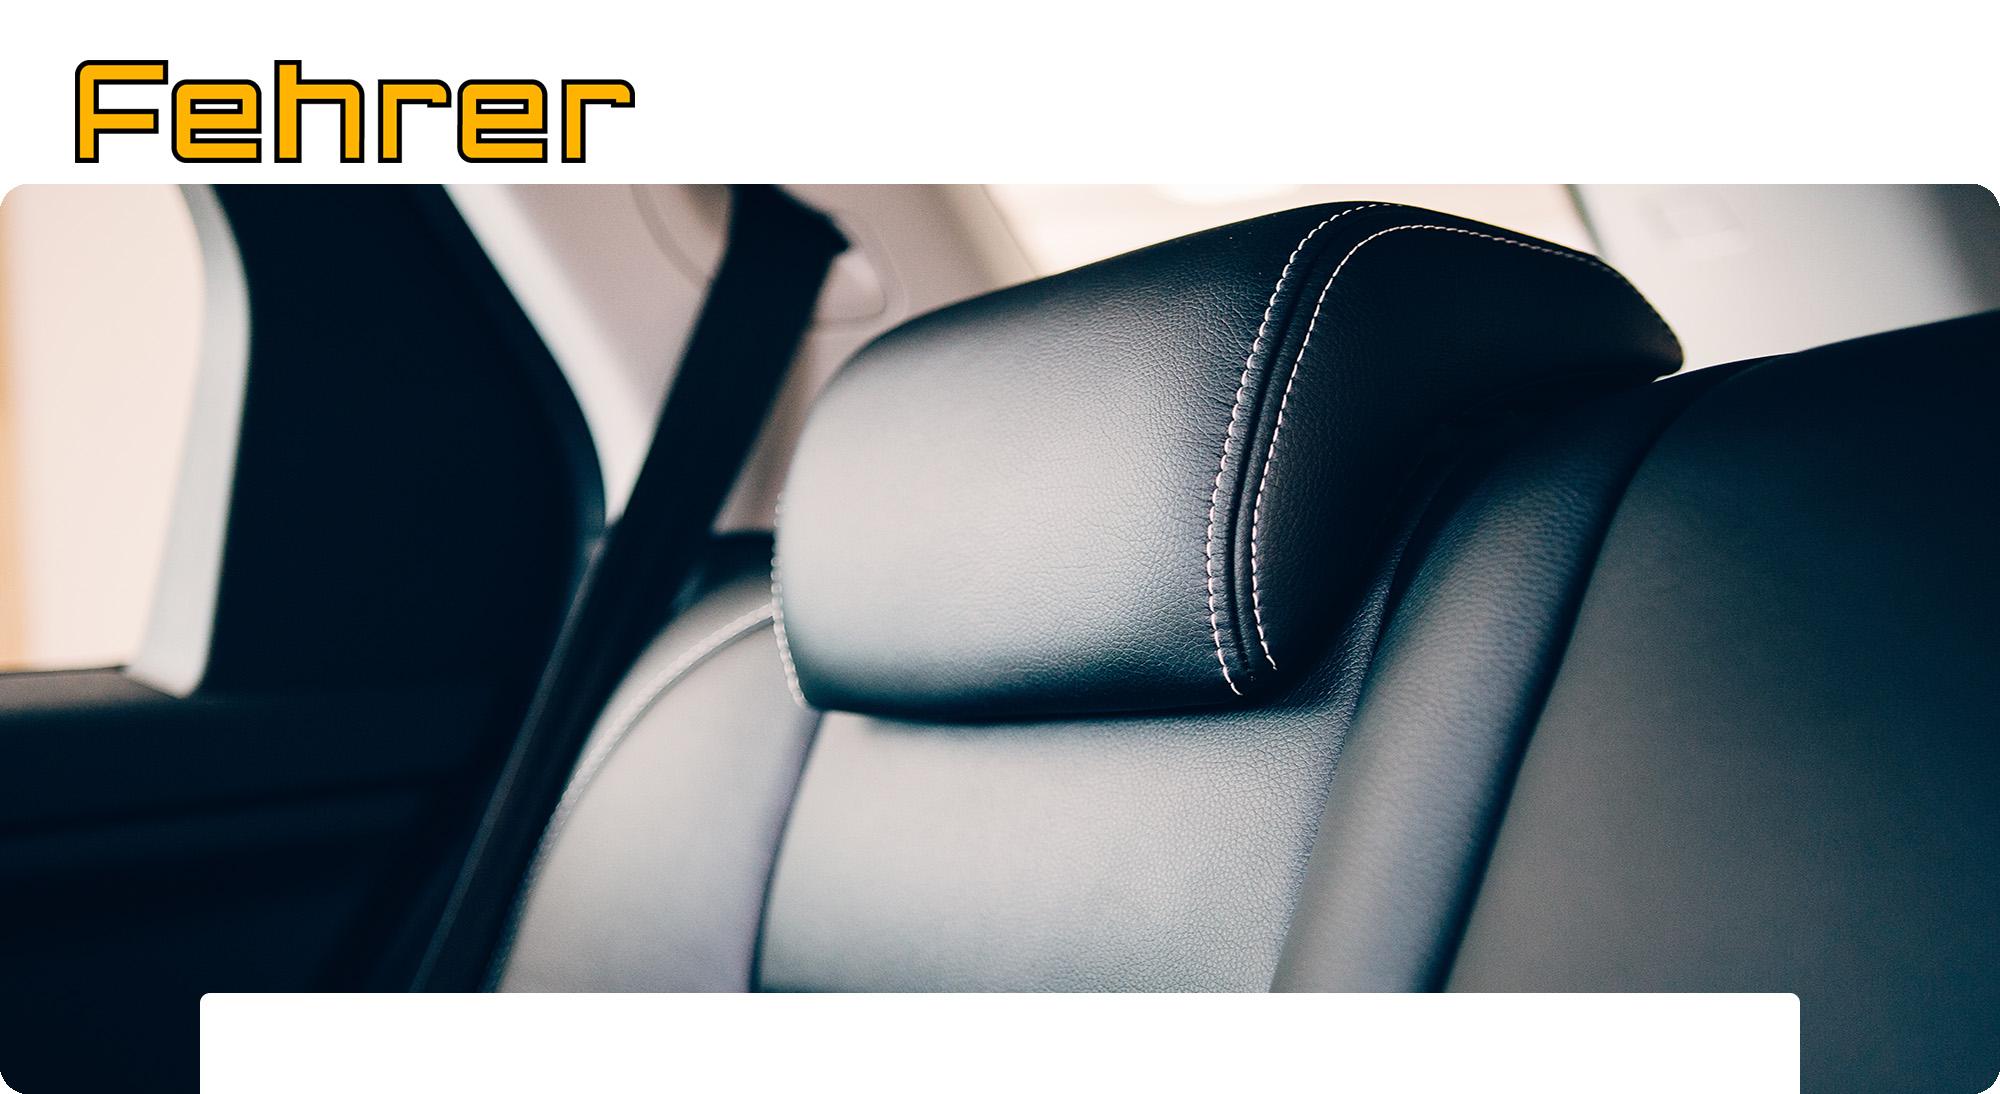 logo fehrer automotive